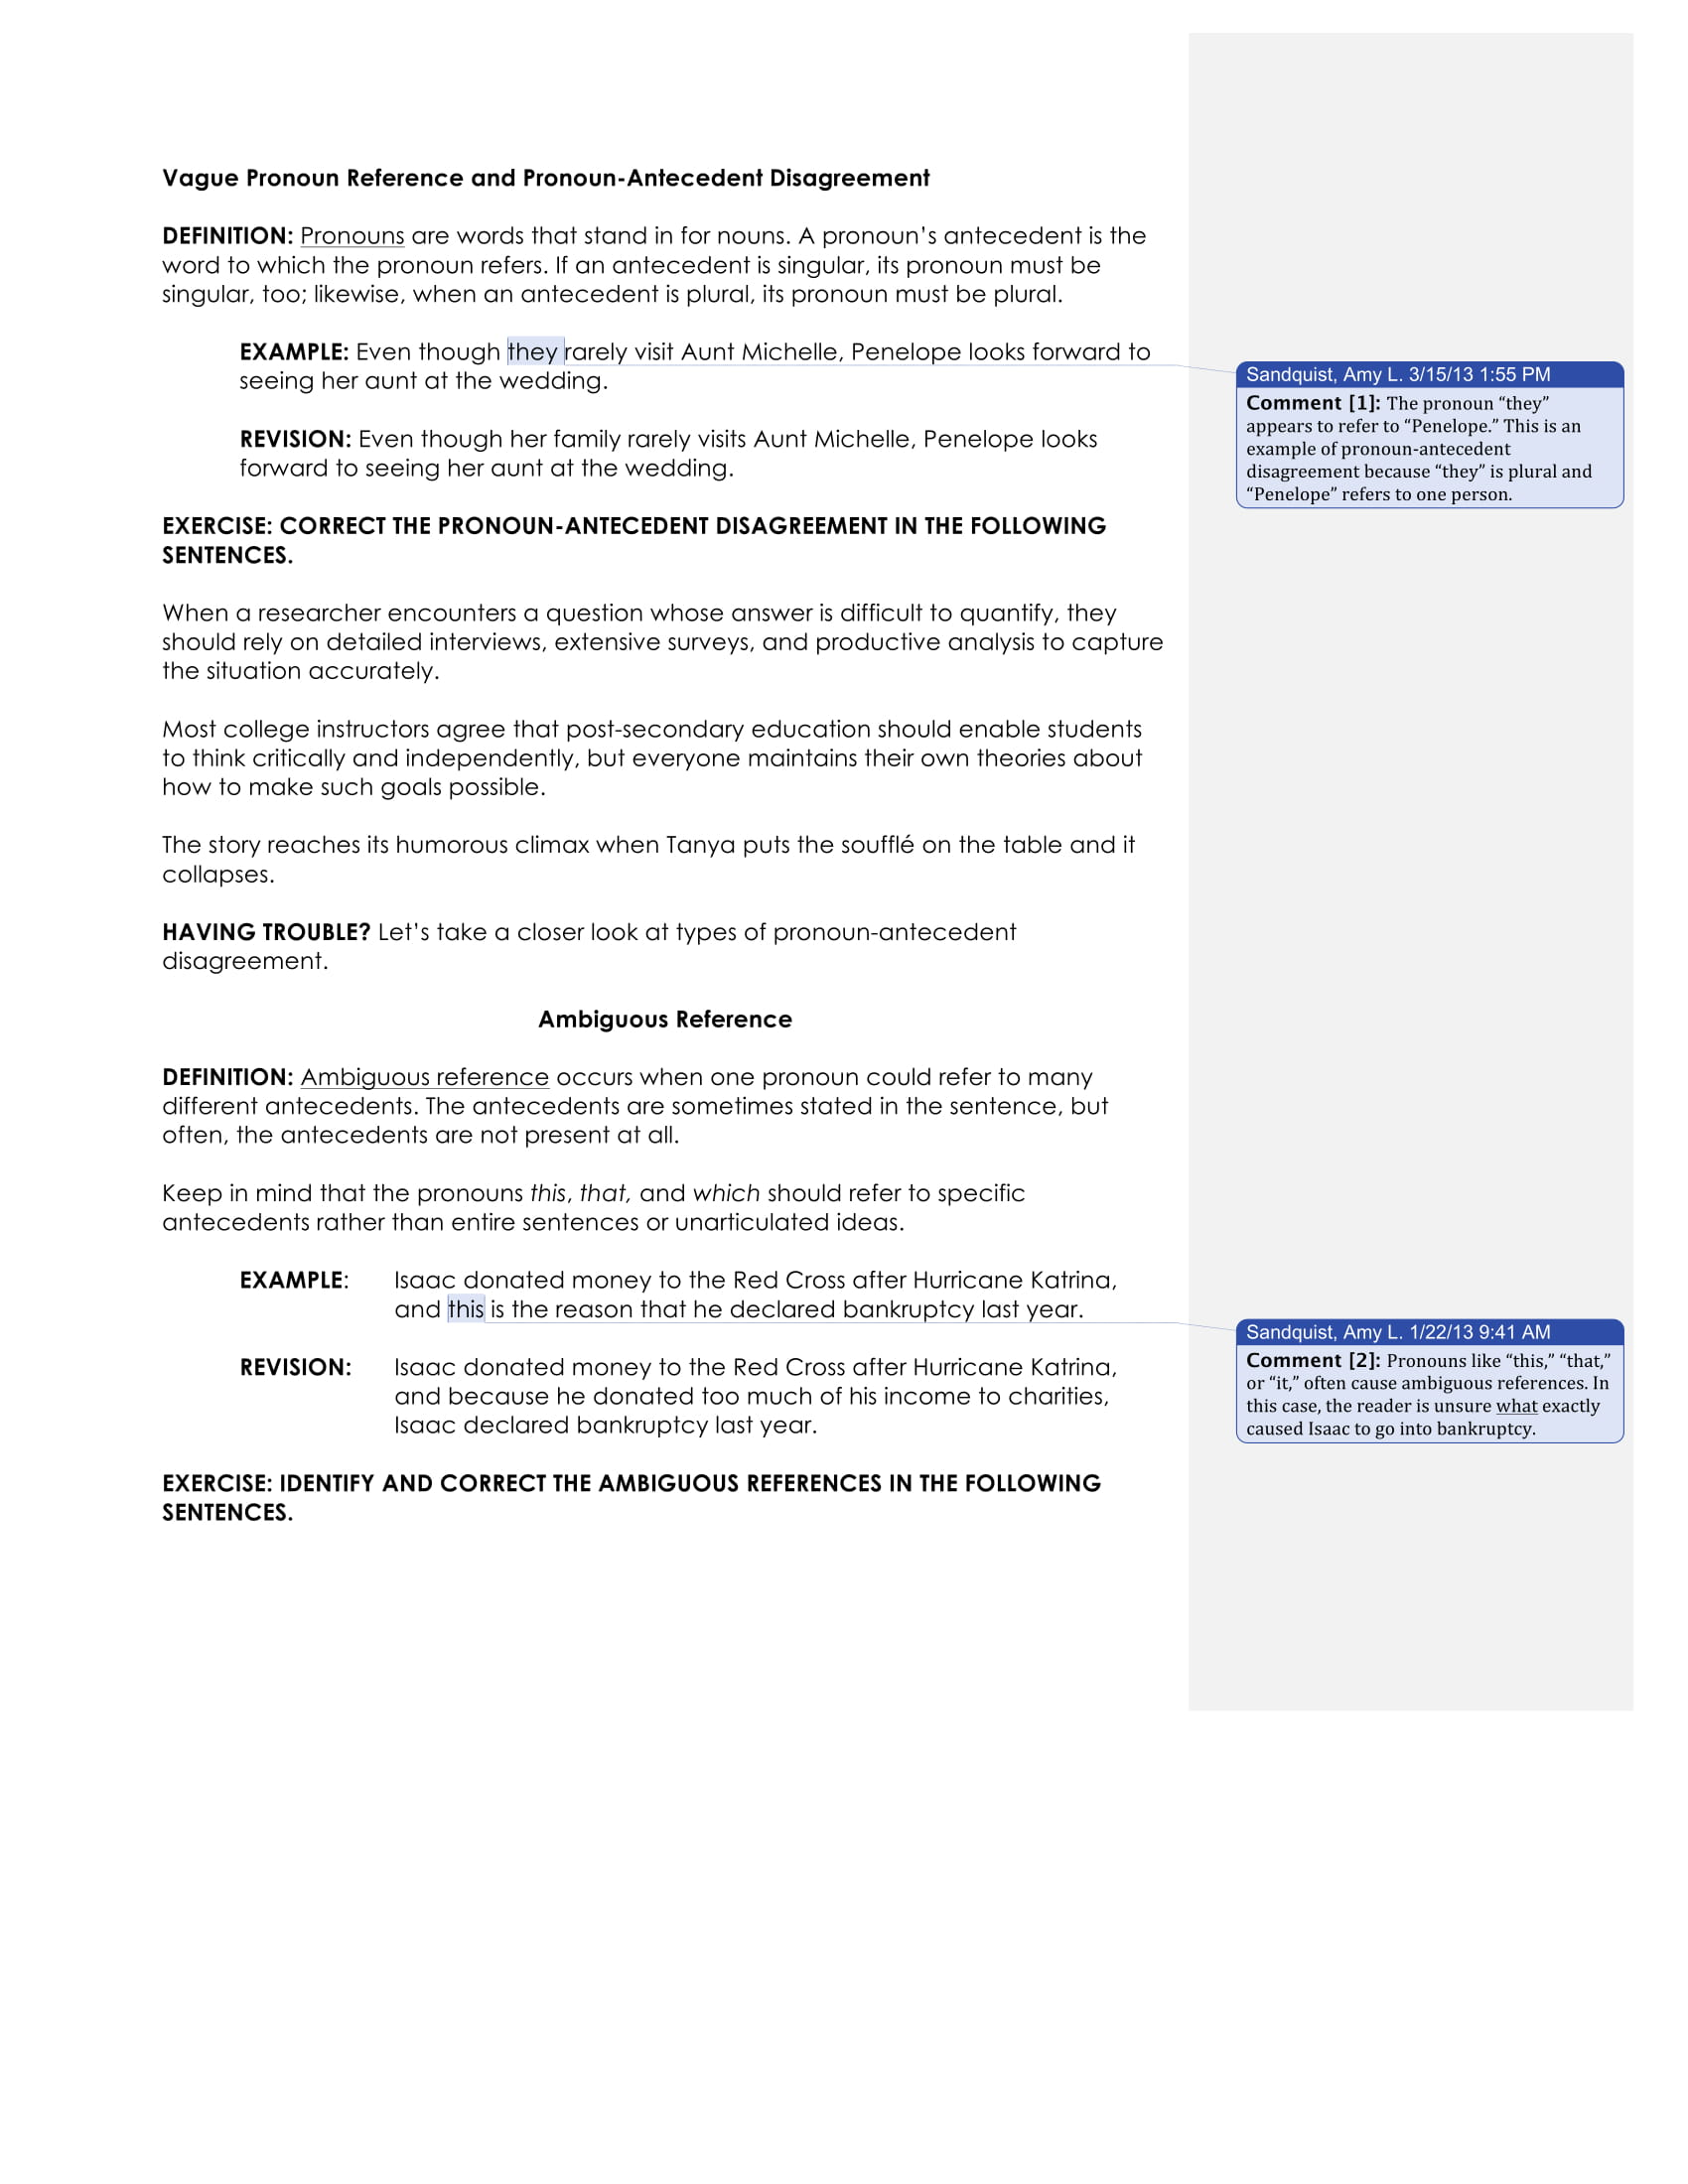 pronoun antecedent disagreement guide example